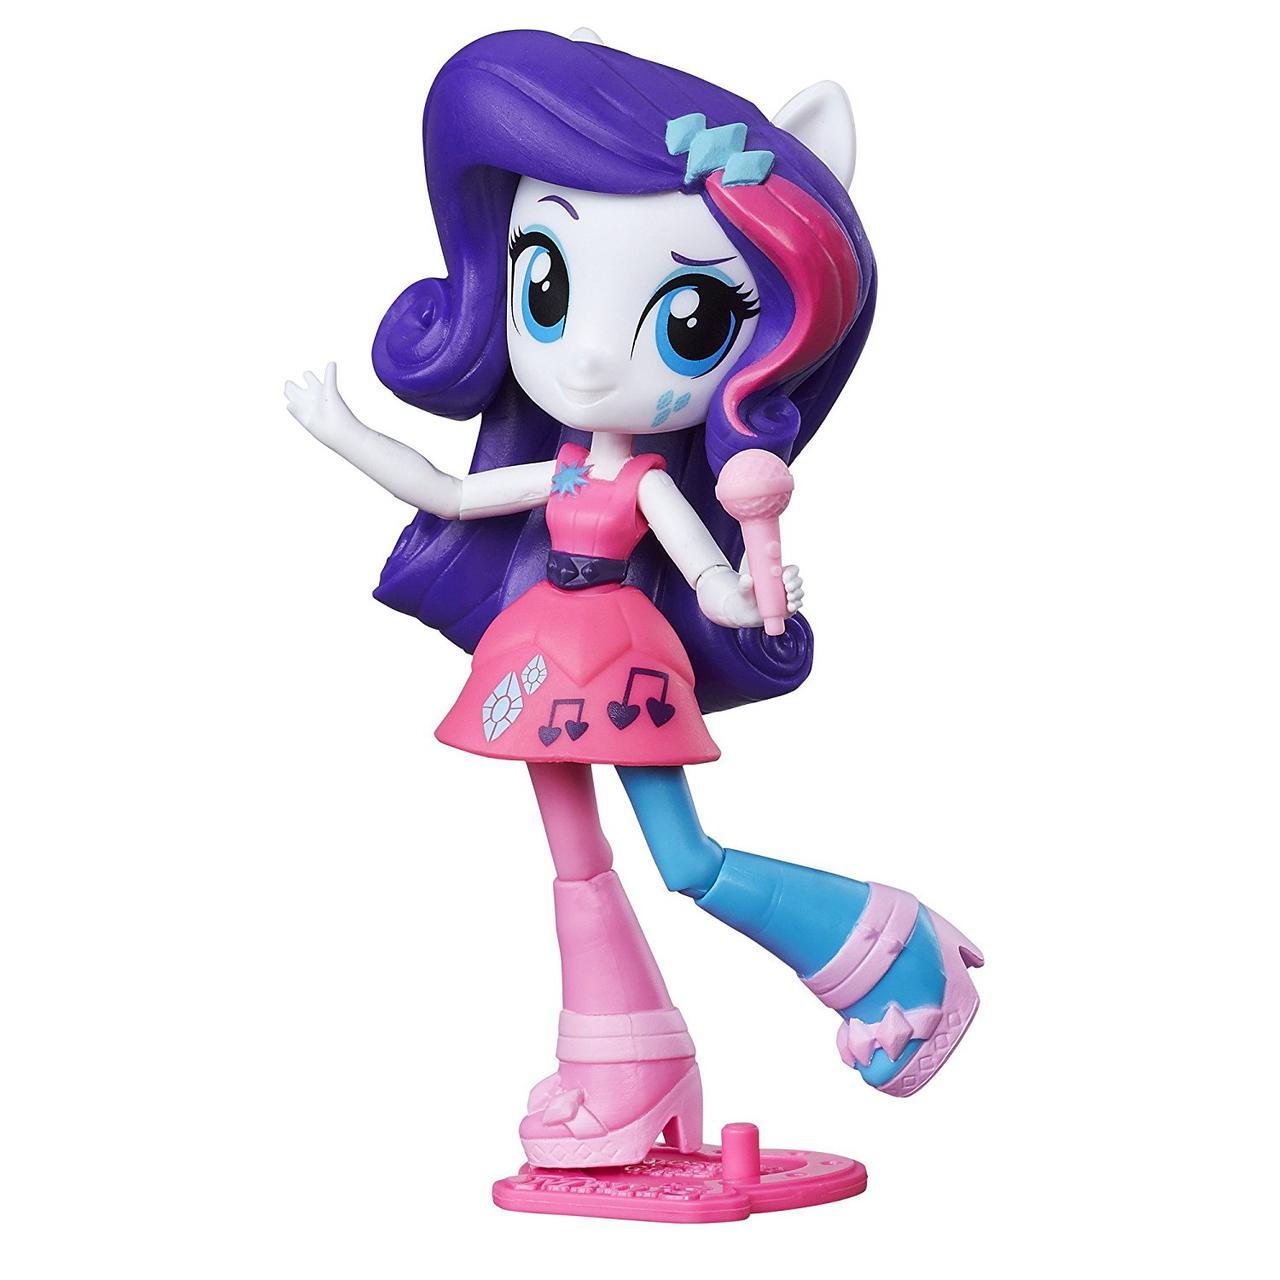 Май литл пони мини Эквестрии Рарити Радужный рок My Little Pony Equestria Girls Minis Rockin Rarity